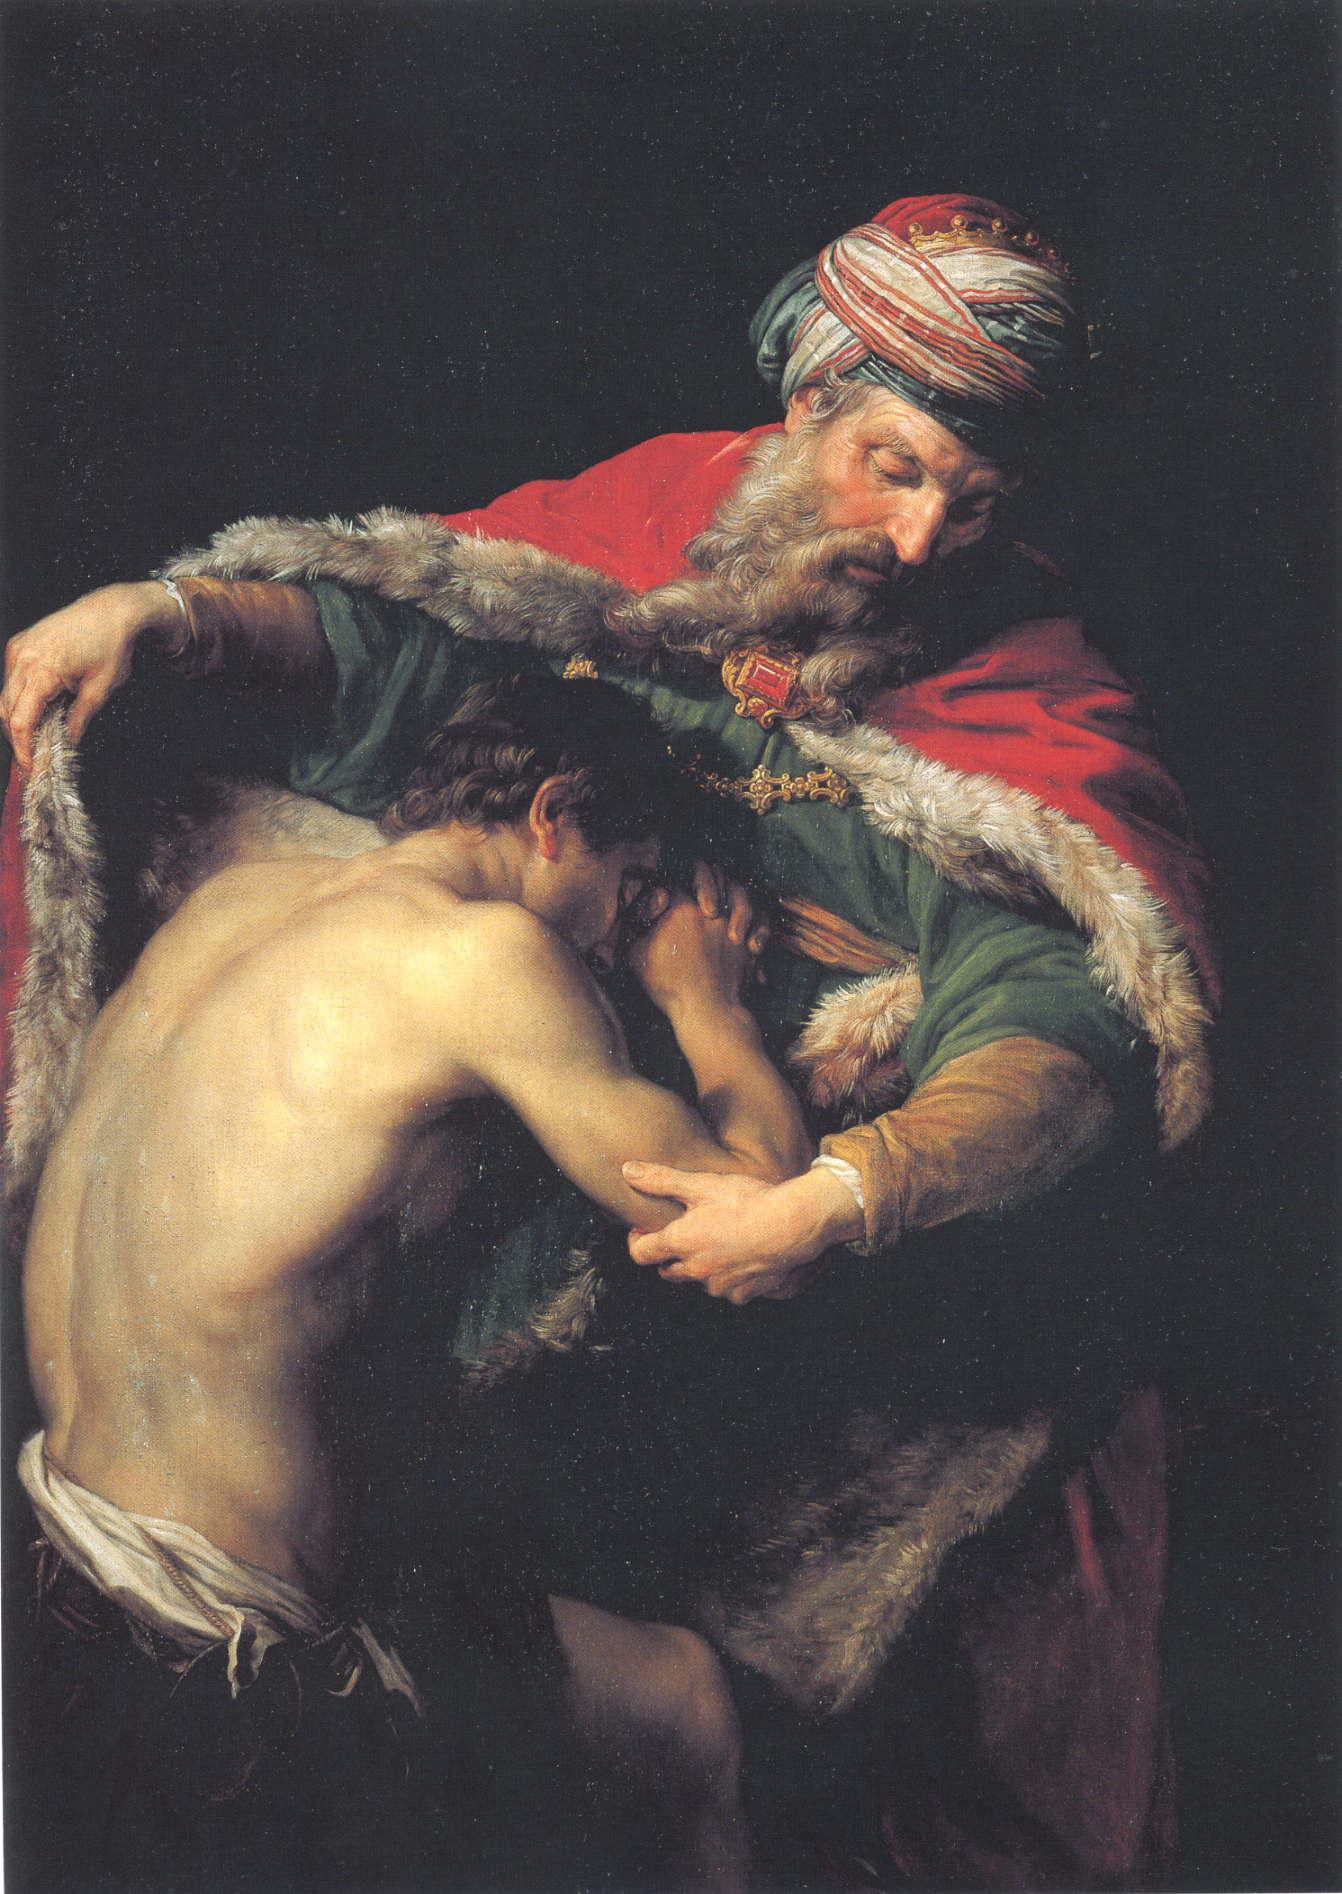 Batoni_1773_Return-of-the-Prodigal-Son_GGW-301